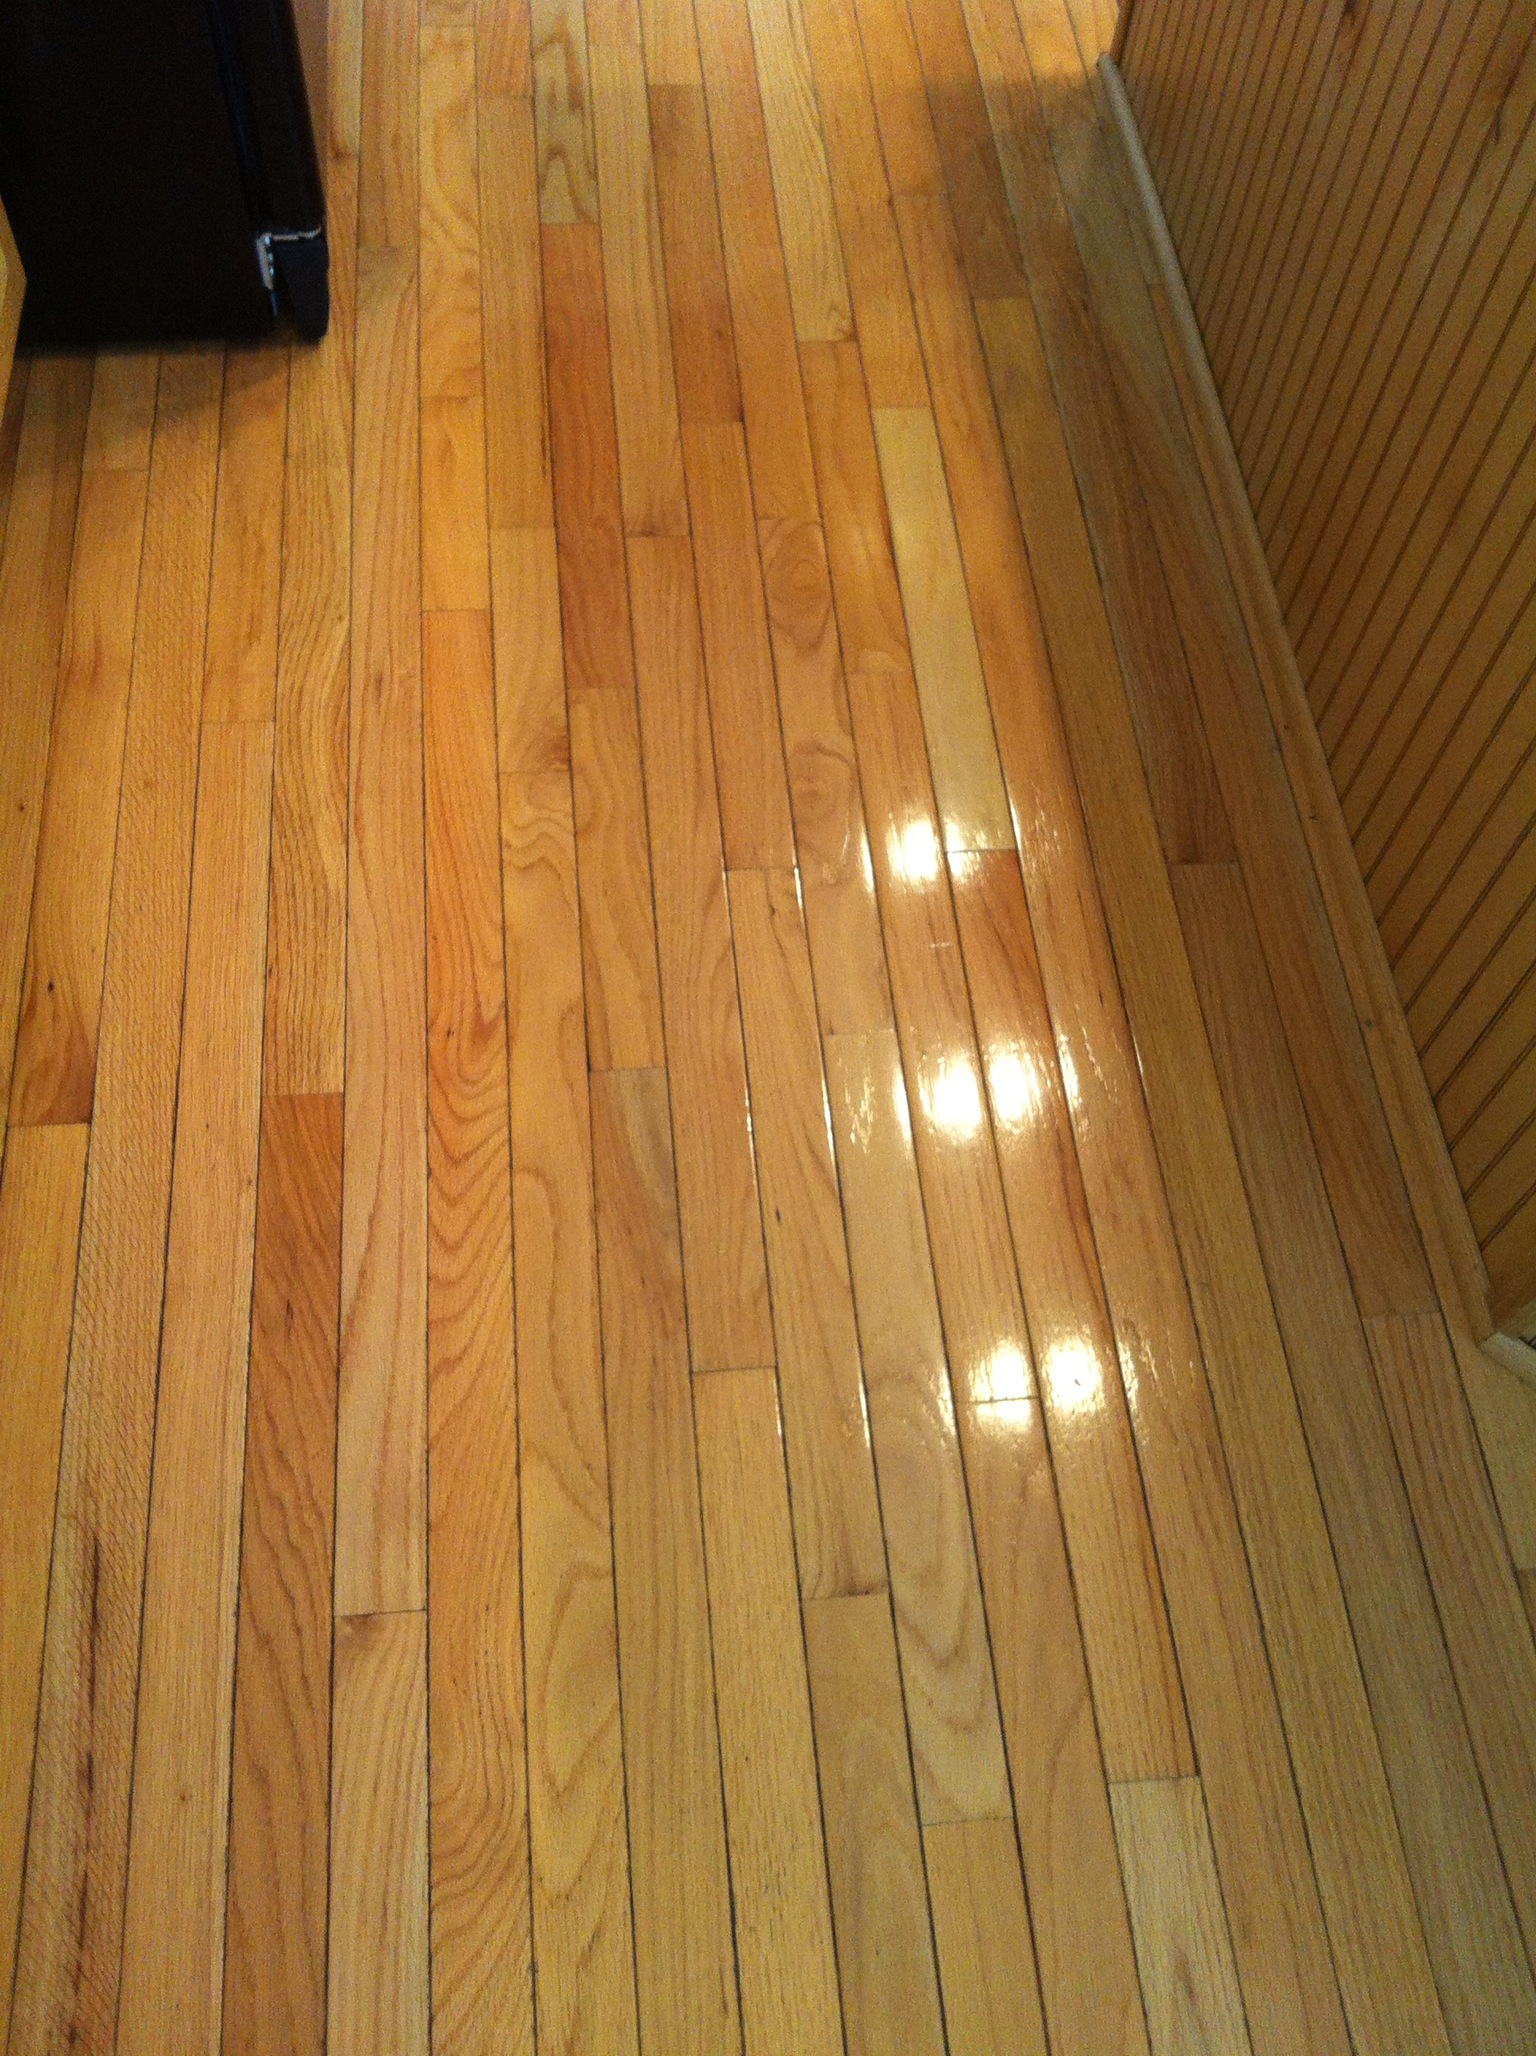 Buffing Hardwood Floors wood floor restorations A Case Study Of Hardwood Floor Cleaning Wood Floor Cleaning Asj